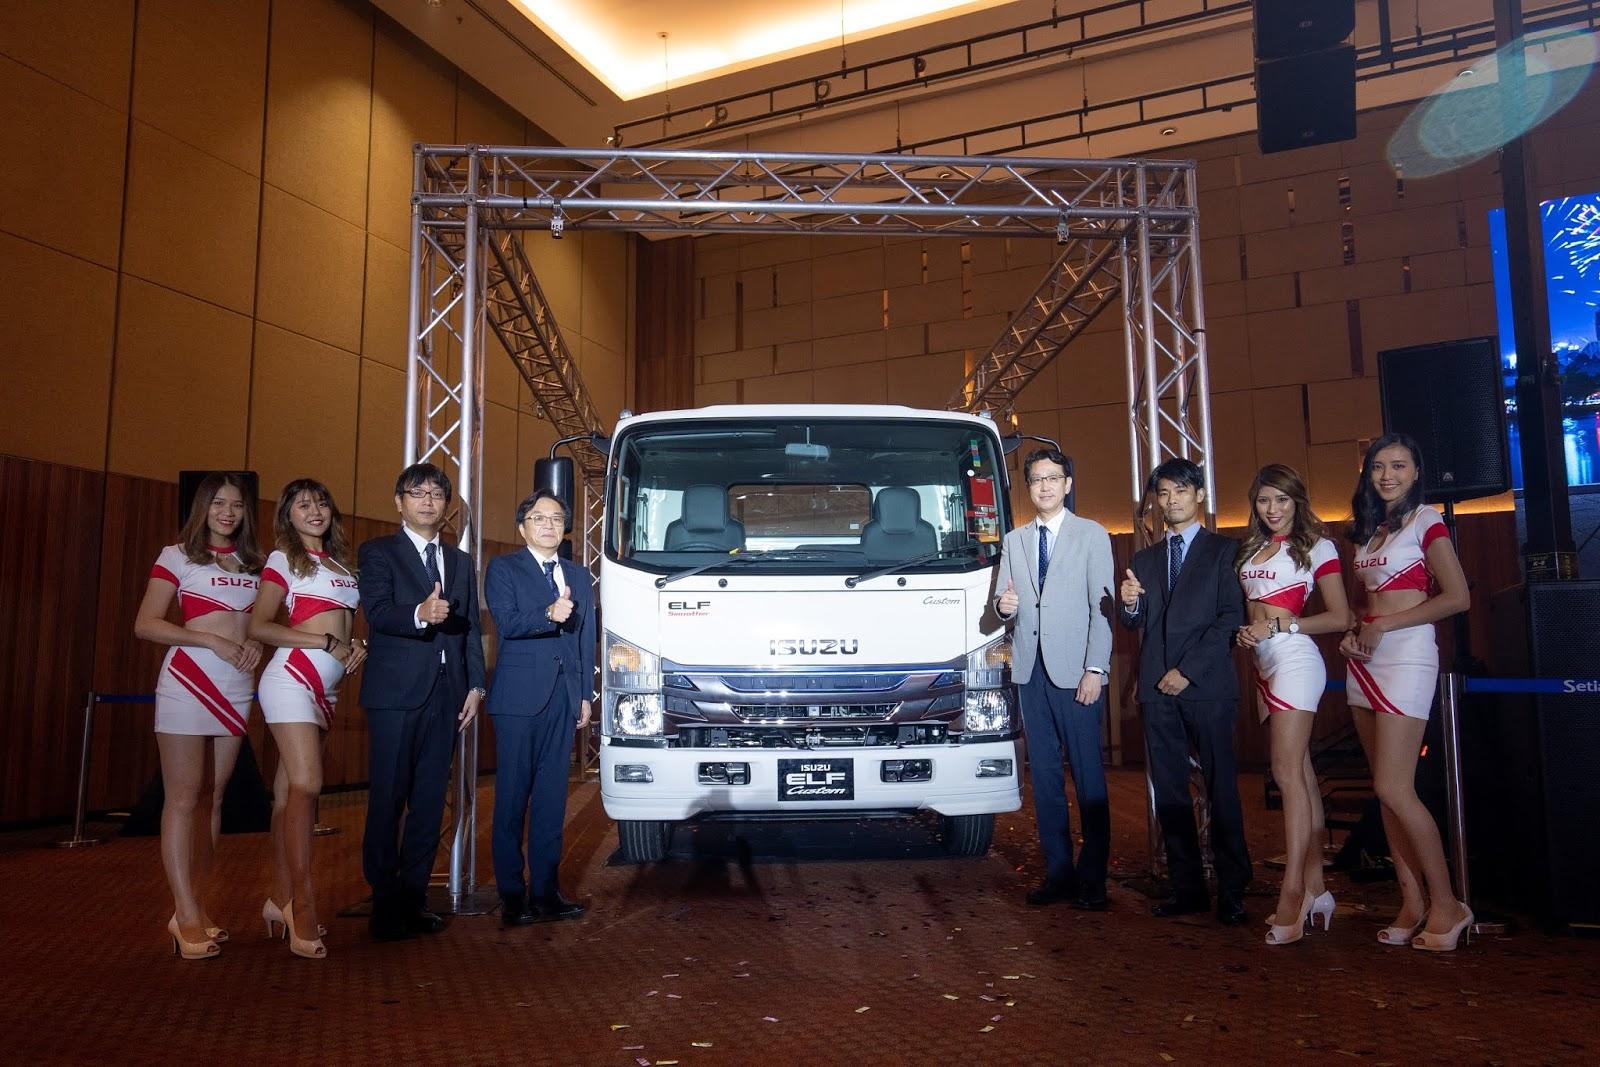 Motoring-Malaysia: Isuzu Malaysia Launches The Latest Isuzu ELF and